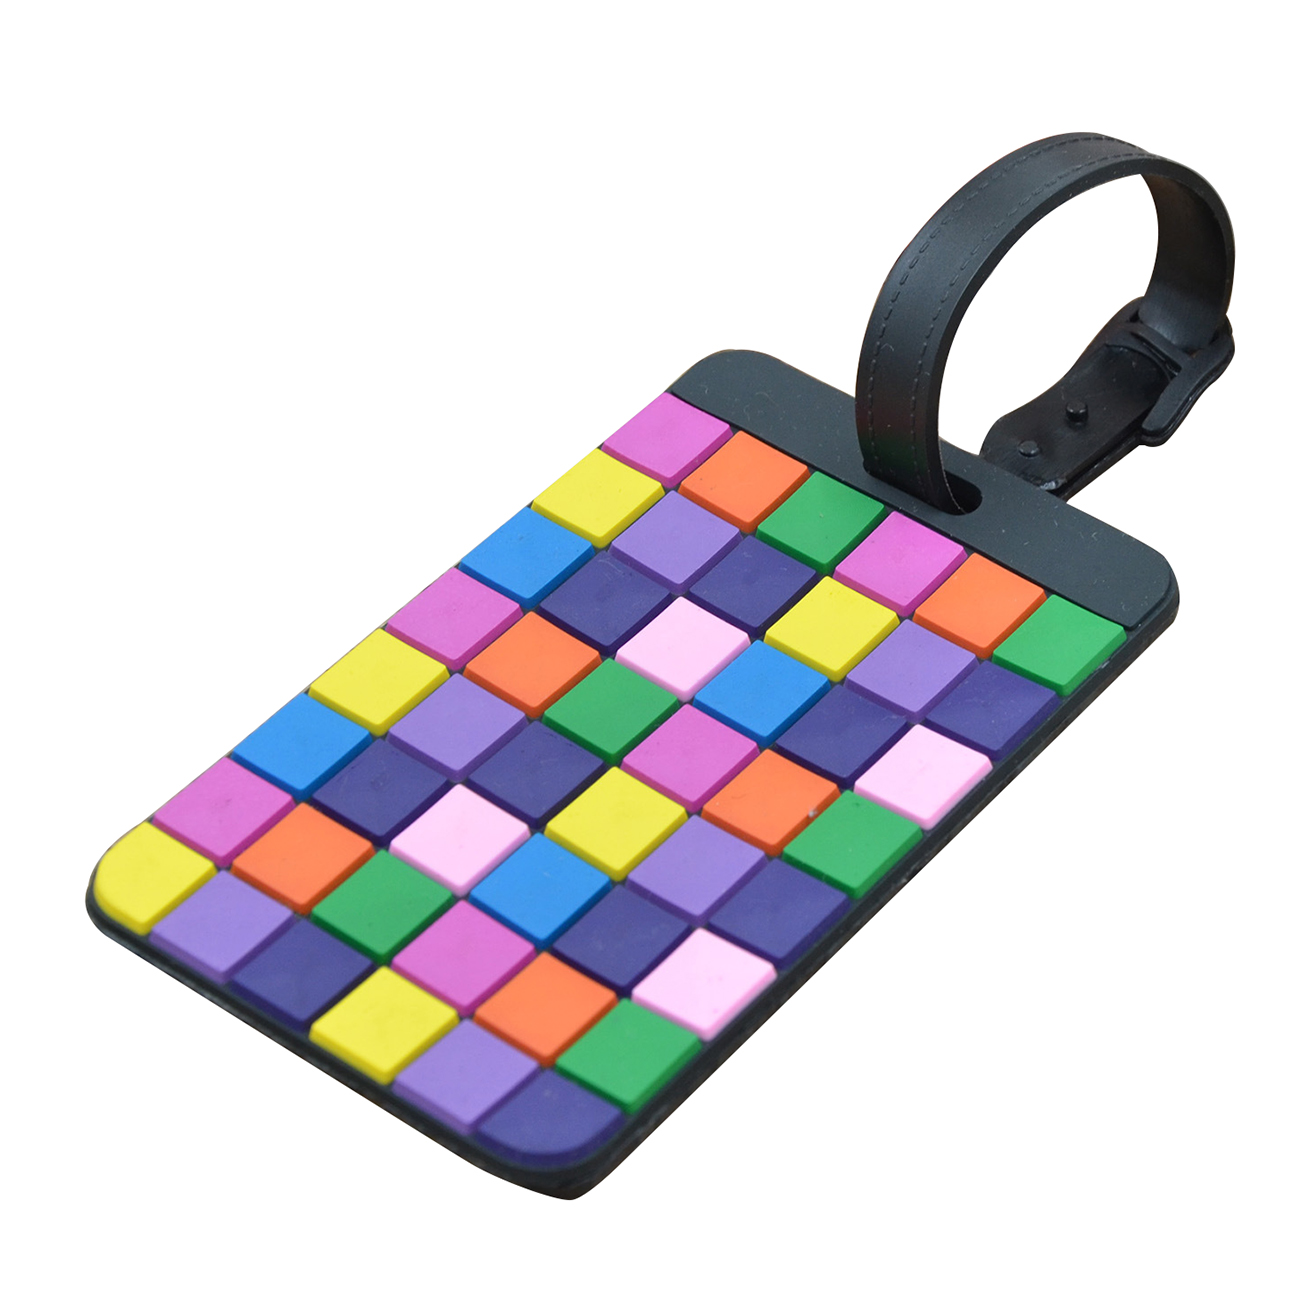 AFBC Portable Secure Travel Suitcase ID Luggage Handbag Large Tag Label (Yellow+Purple)